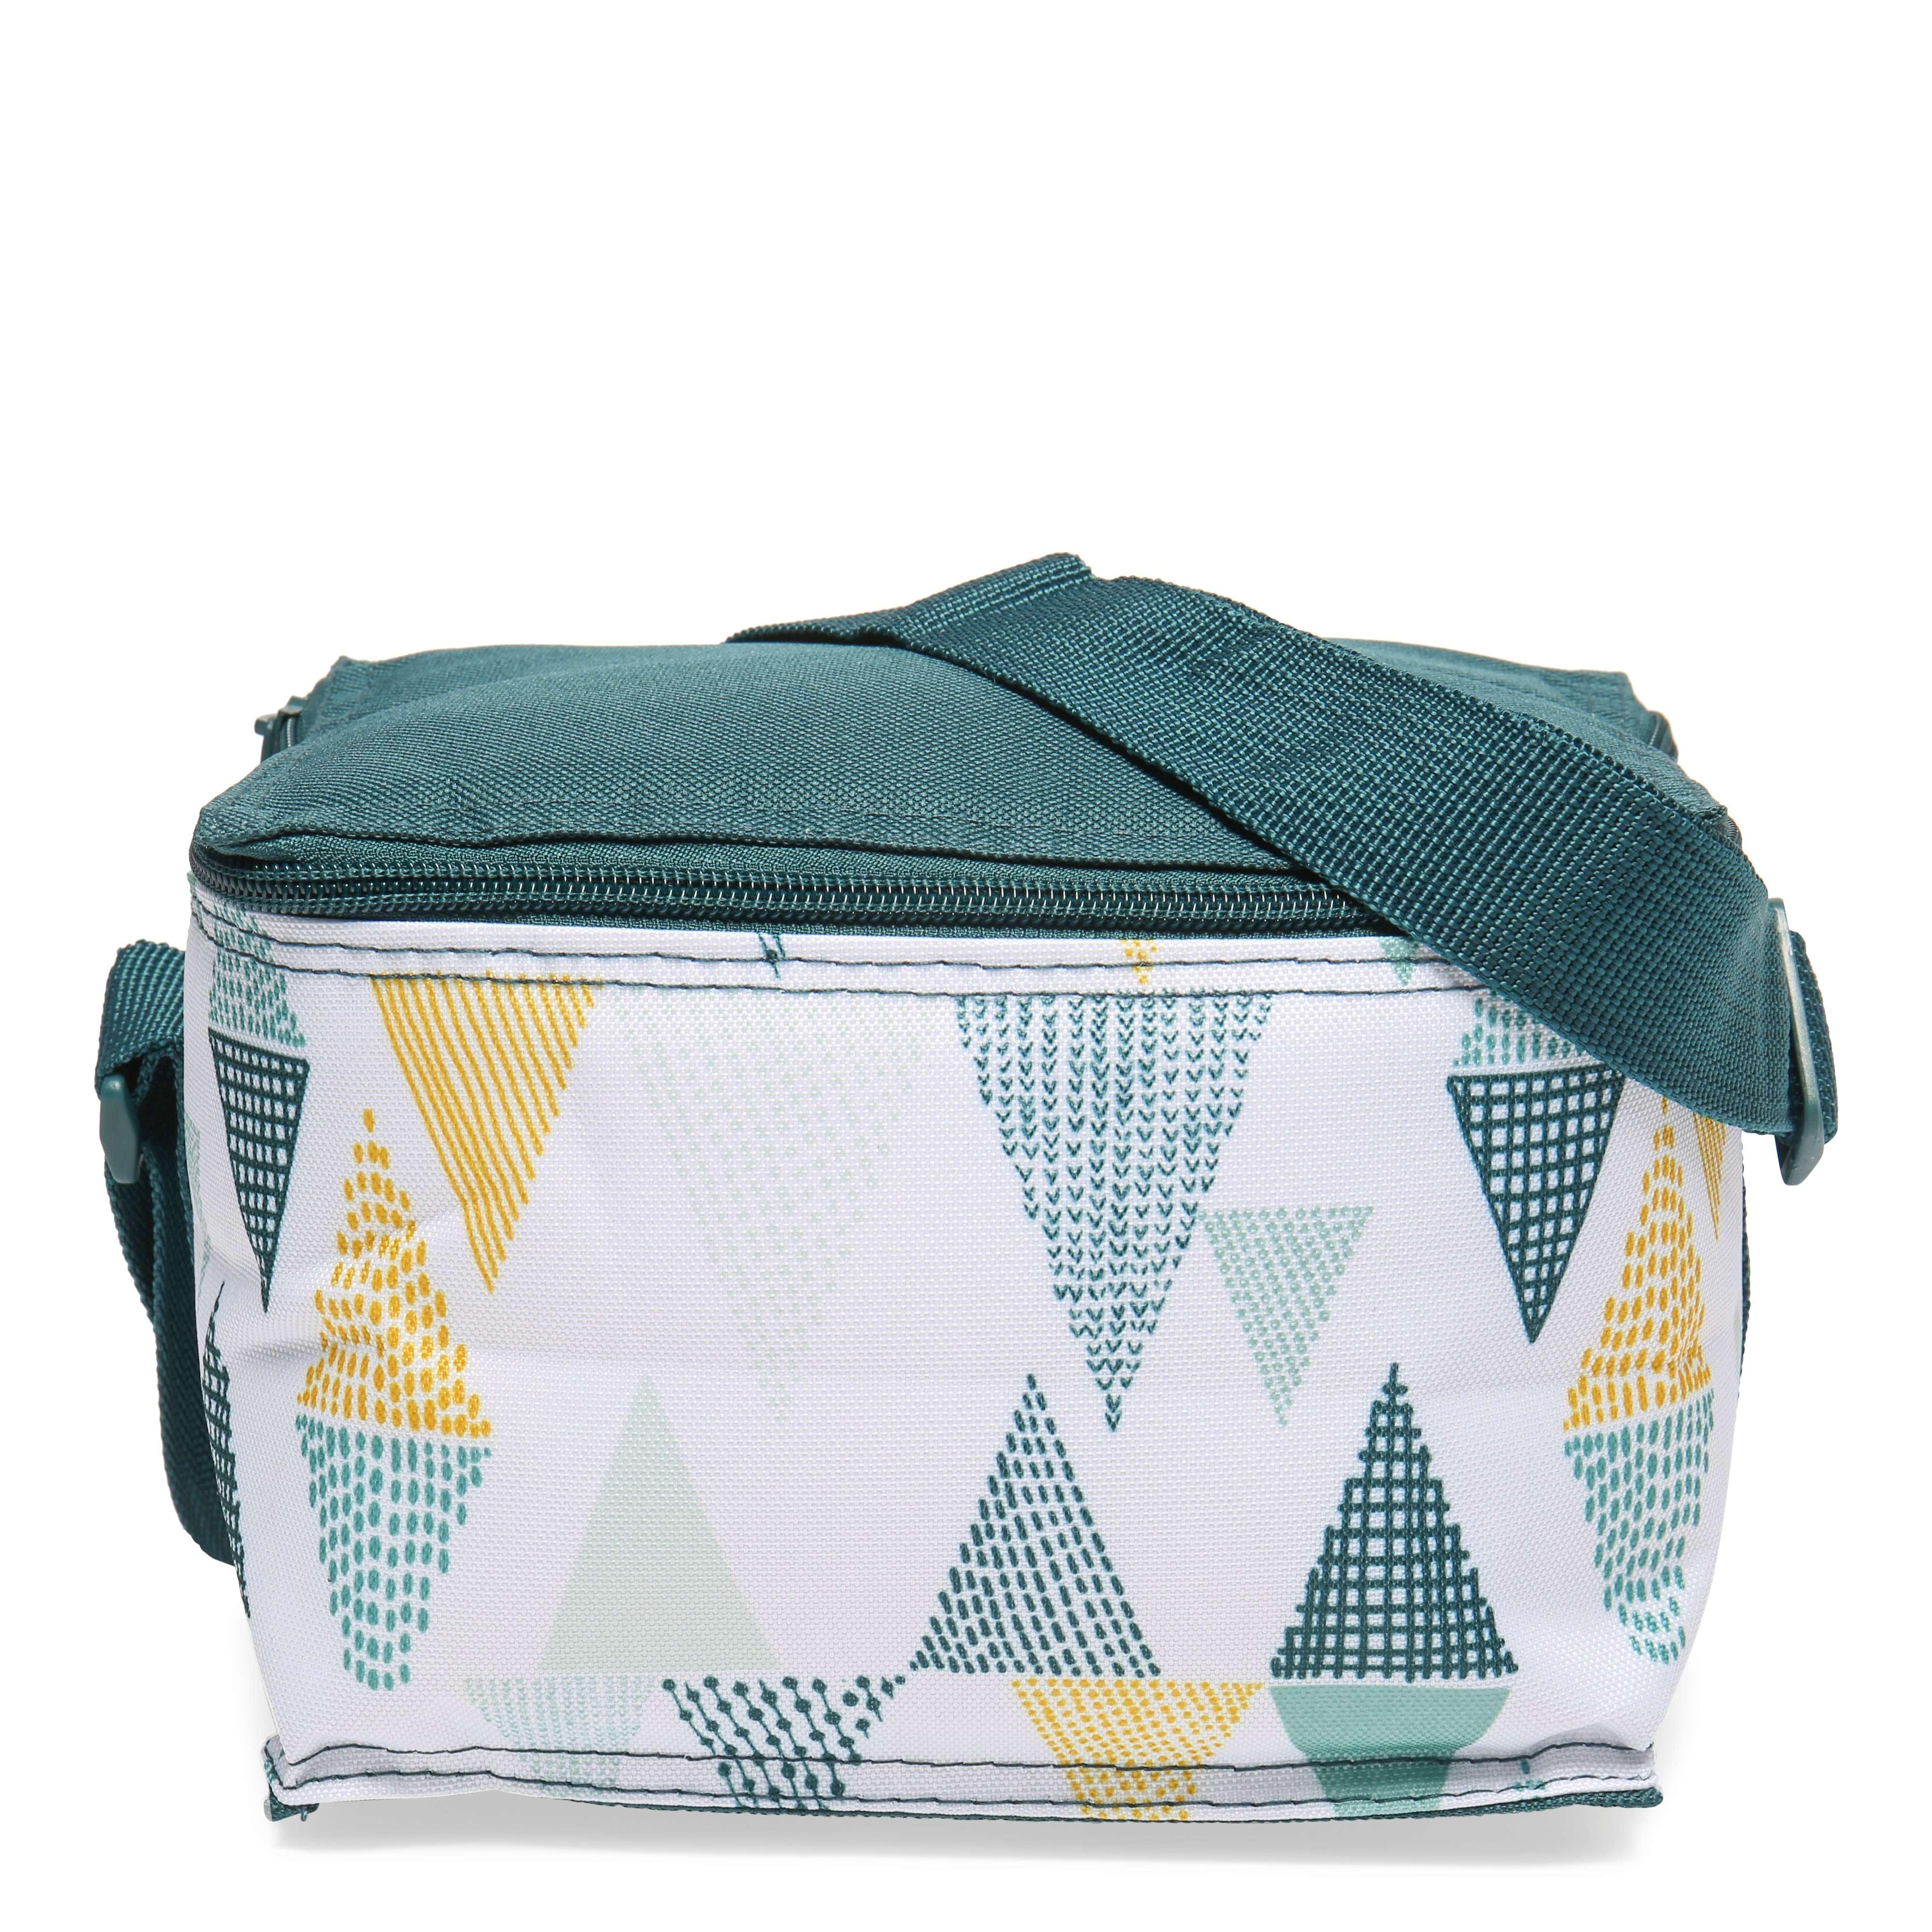 EUROHIKE Cooler Bag